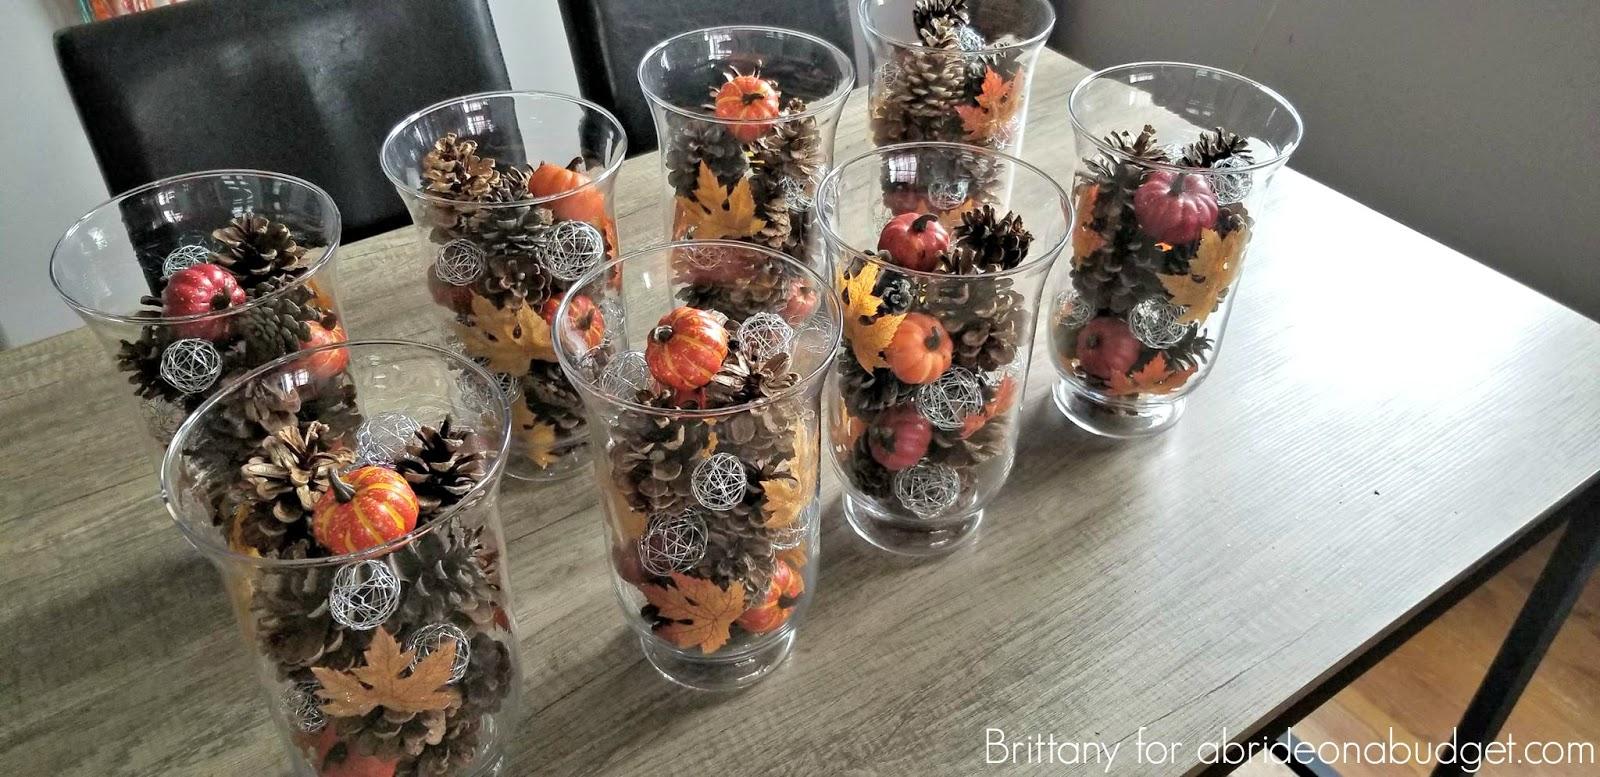 Fall Wedding Centerpieces On A Budget: DIY Pine Cones And Pumpkins Fall Wedding Centerpieces